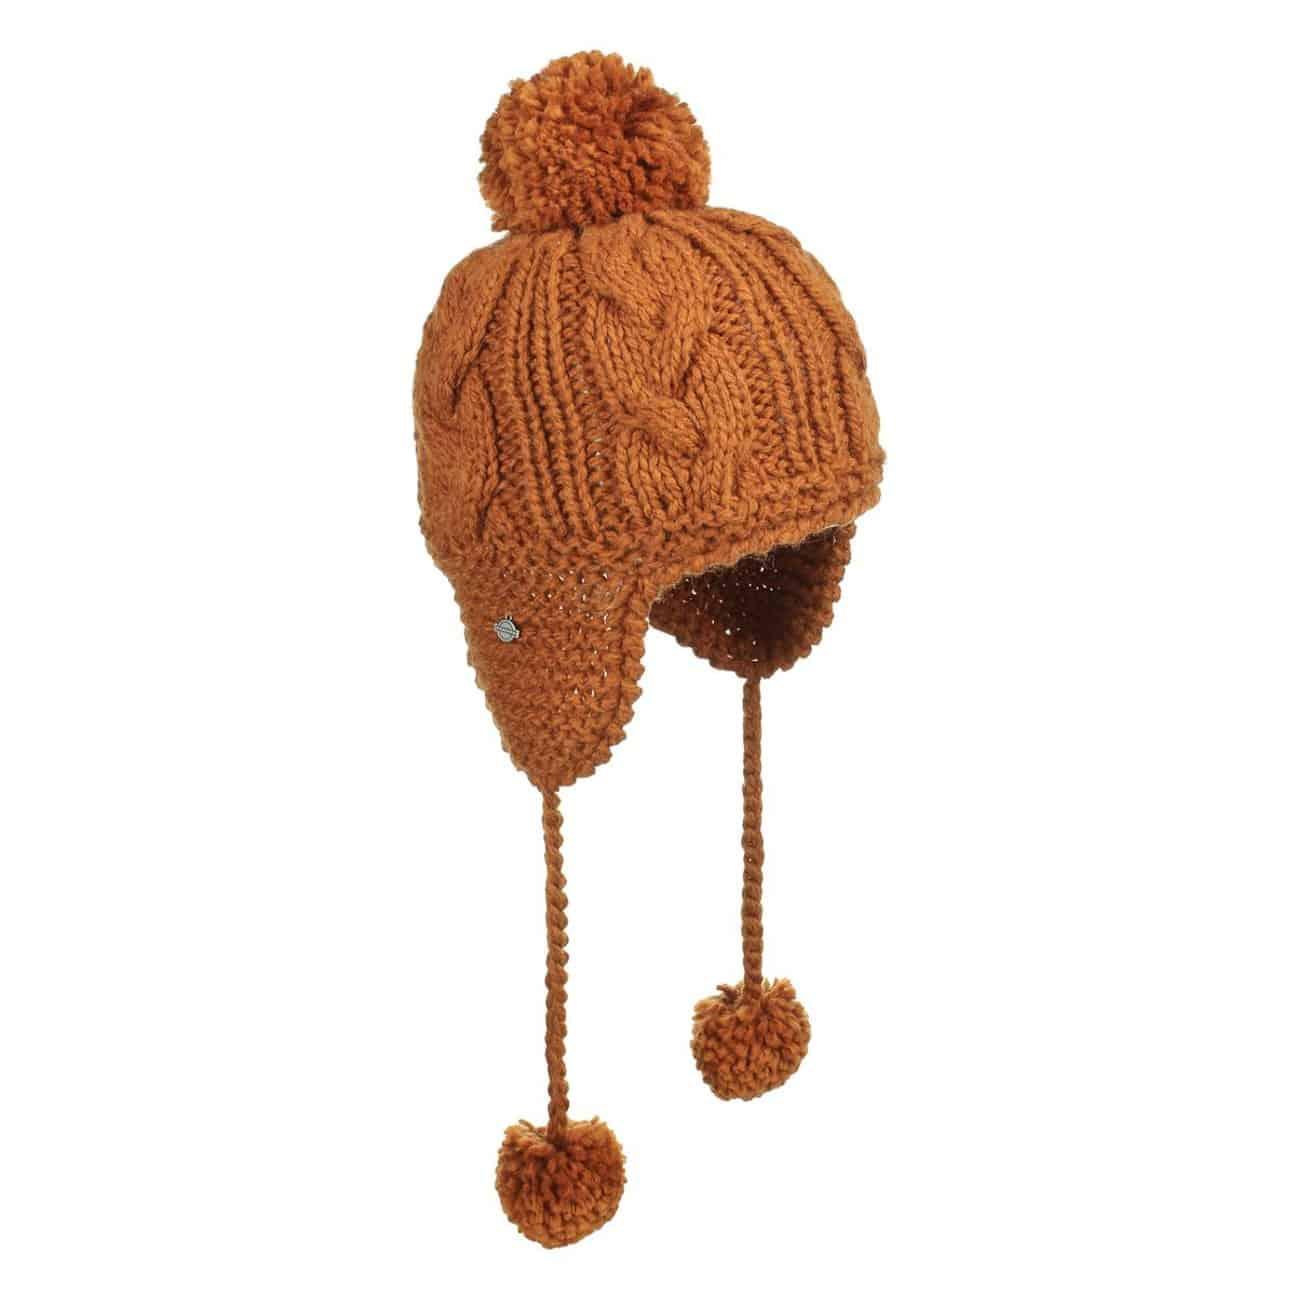 Gorro Peruano Christin by Seeberger - Gorros - sombreroshop.es